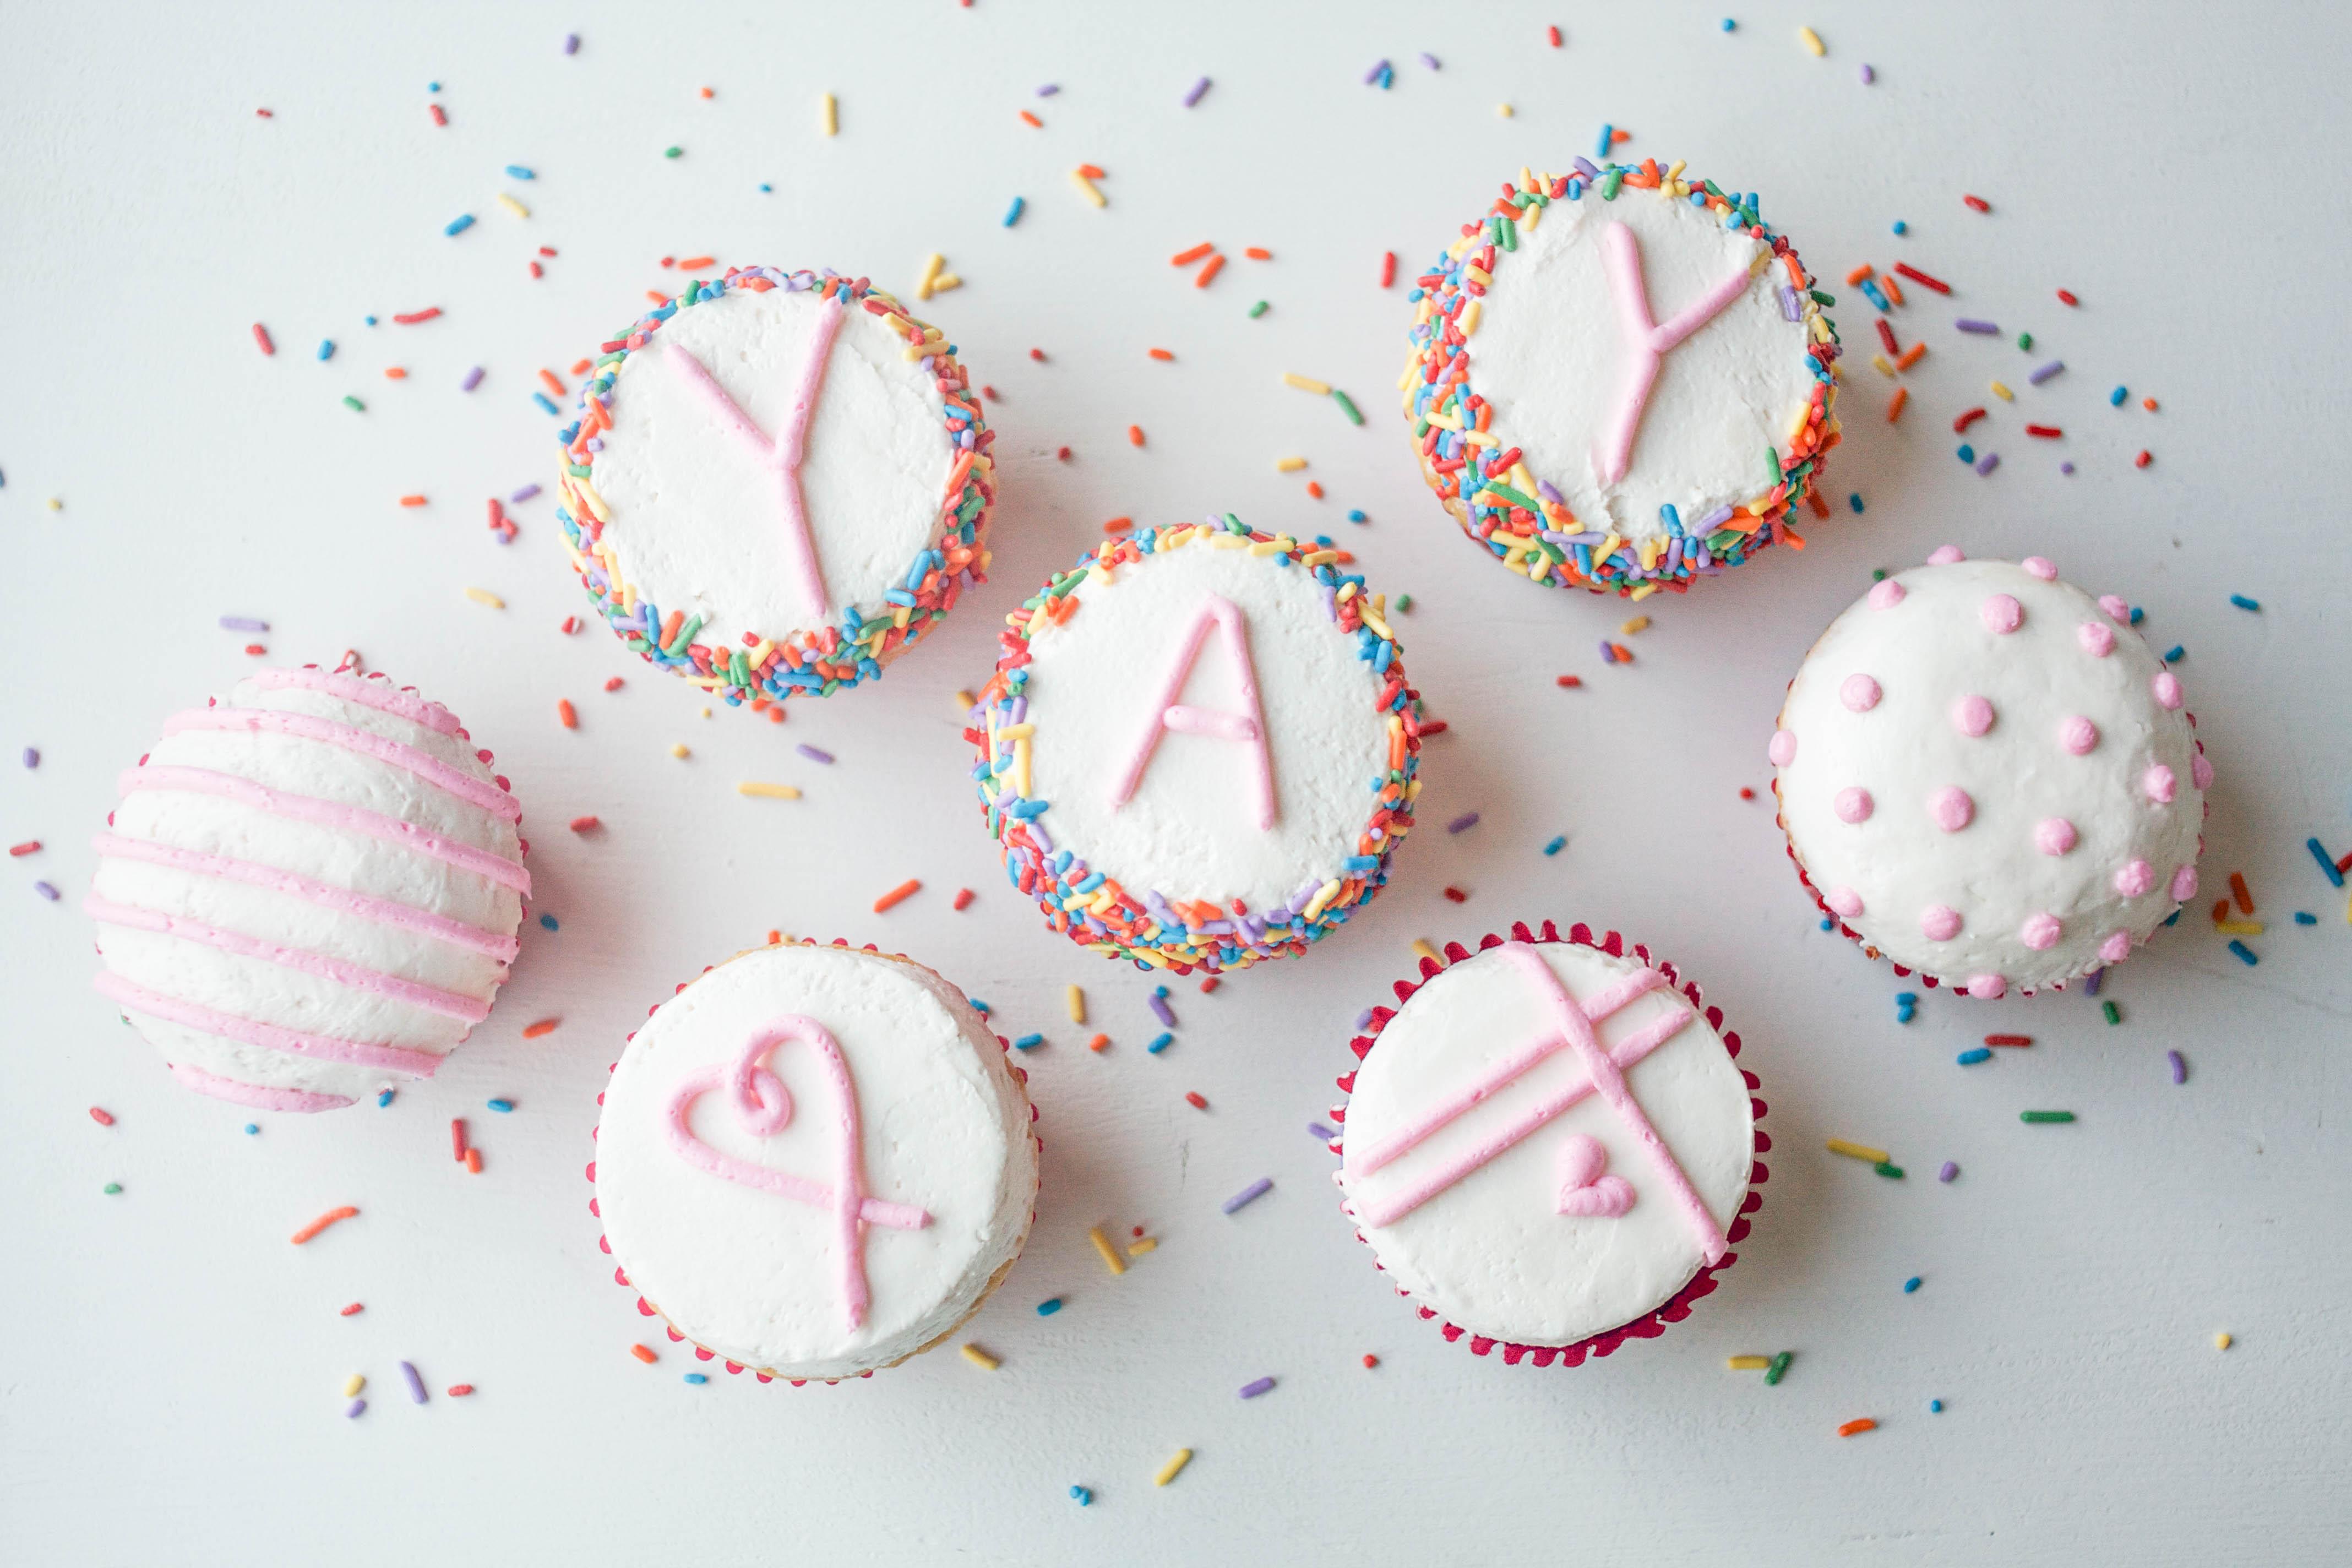 Flat Top Buttercream Cupcakes | Erin Gardner | Bluprint